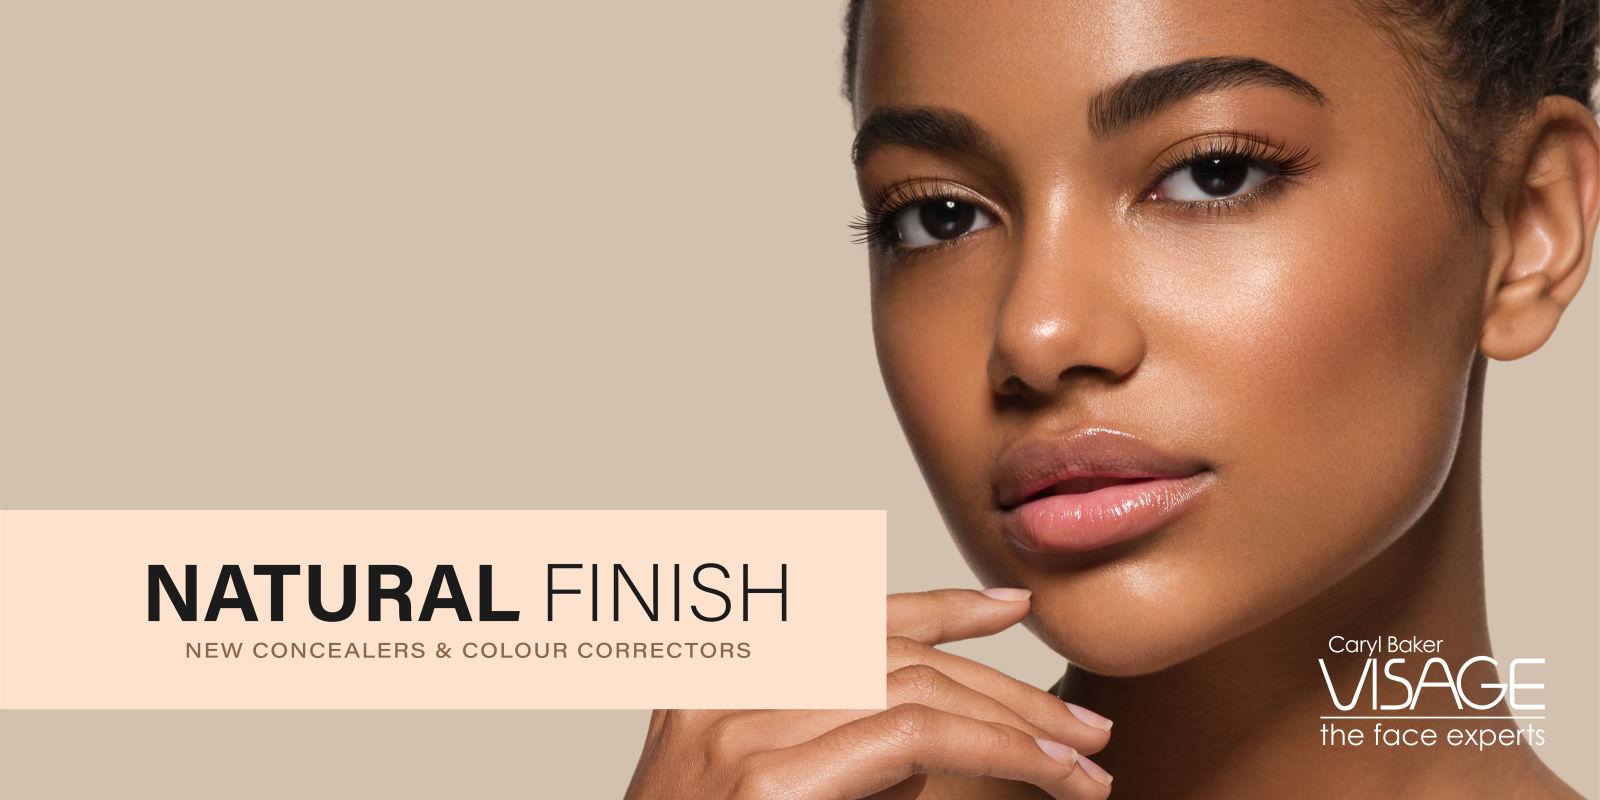 [Image] [offer] Natural Finish New Concealers & Correctors